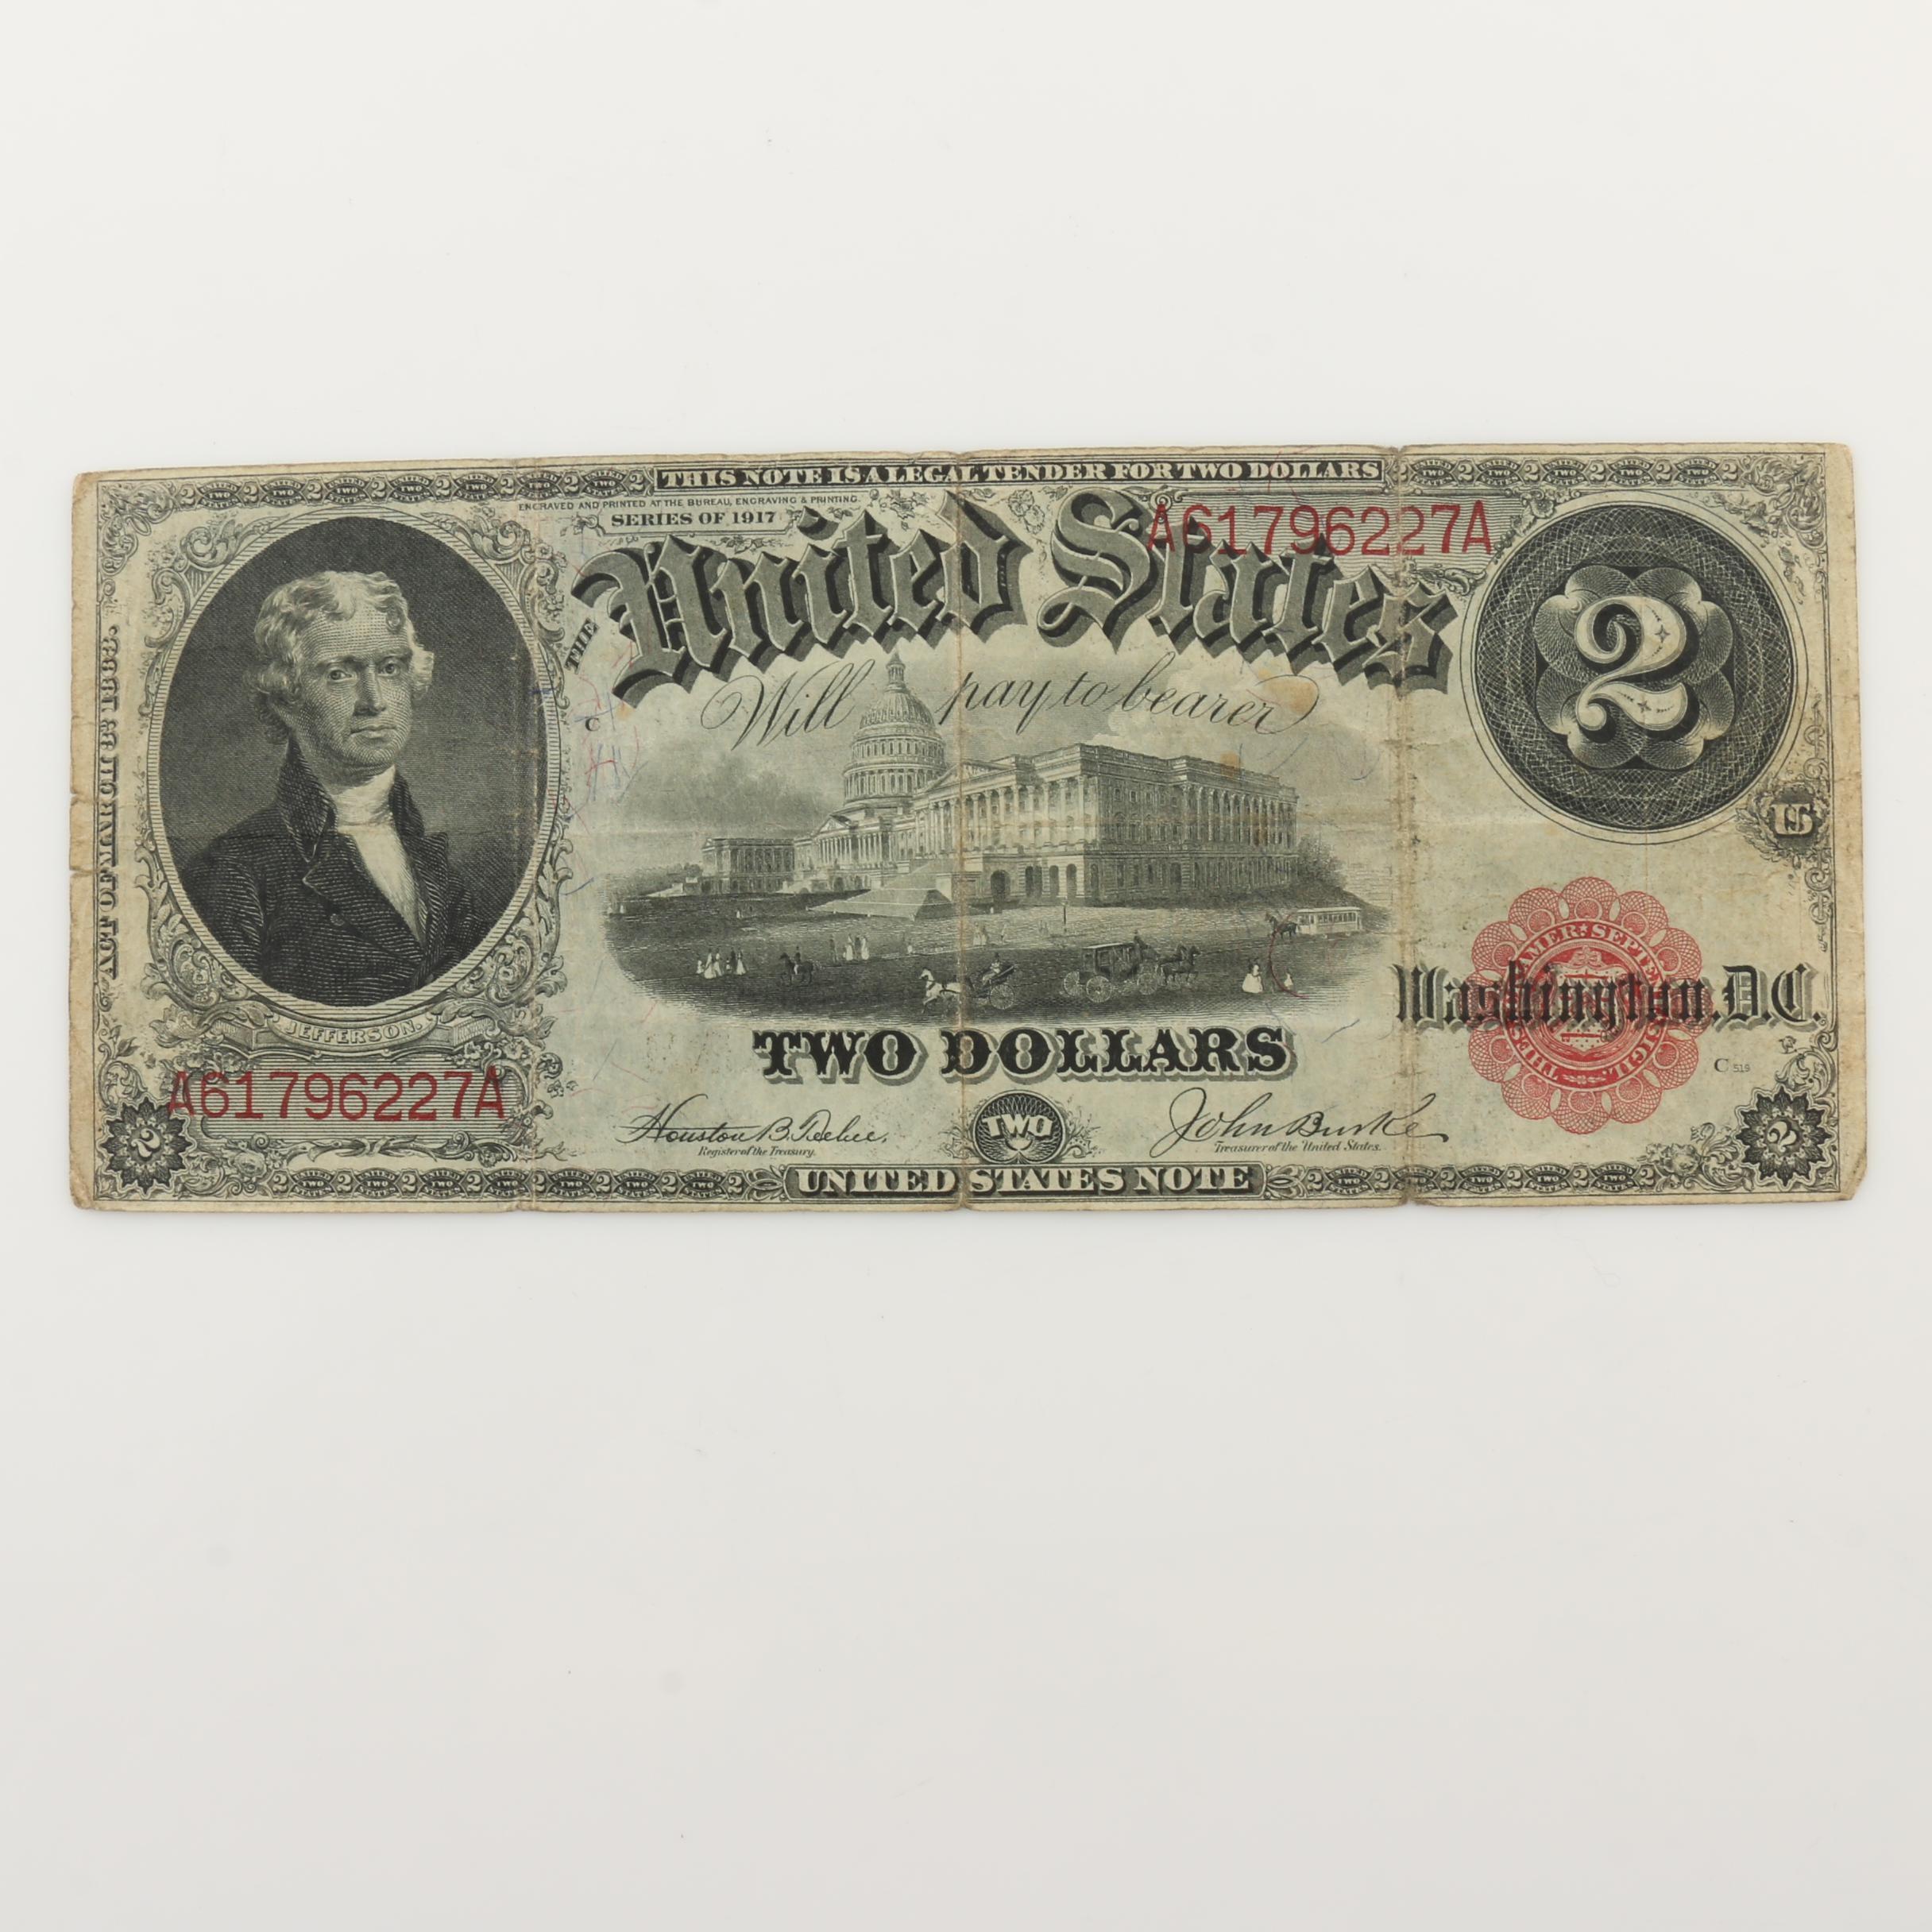 Large Format Series of 1917 $2 Legal Tender Note